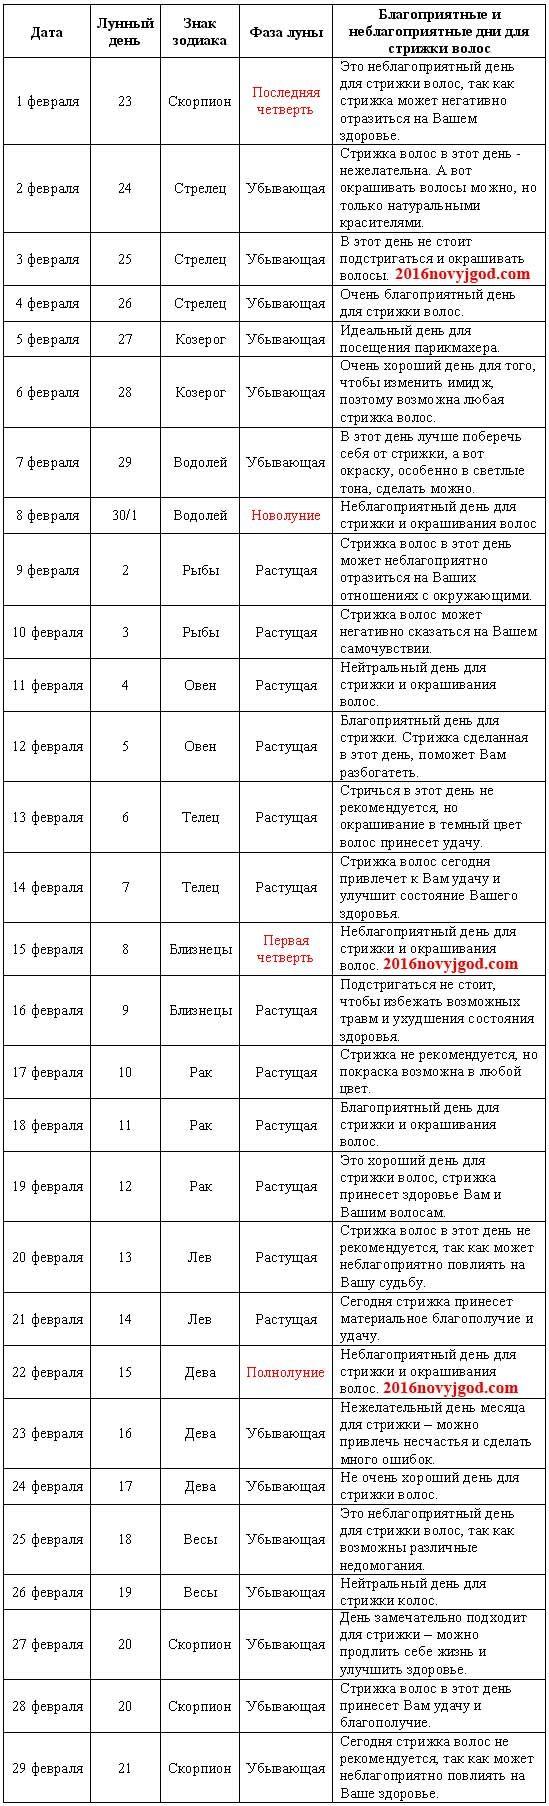 Лунный календарь стрижек на февраль 2016 года - http://2016novyjgod.com/2015/11/lunnyj-kalendar-strizhki-volos-na-fevral-2016-goda-blagopriyatnye-dni/